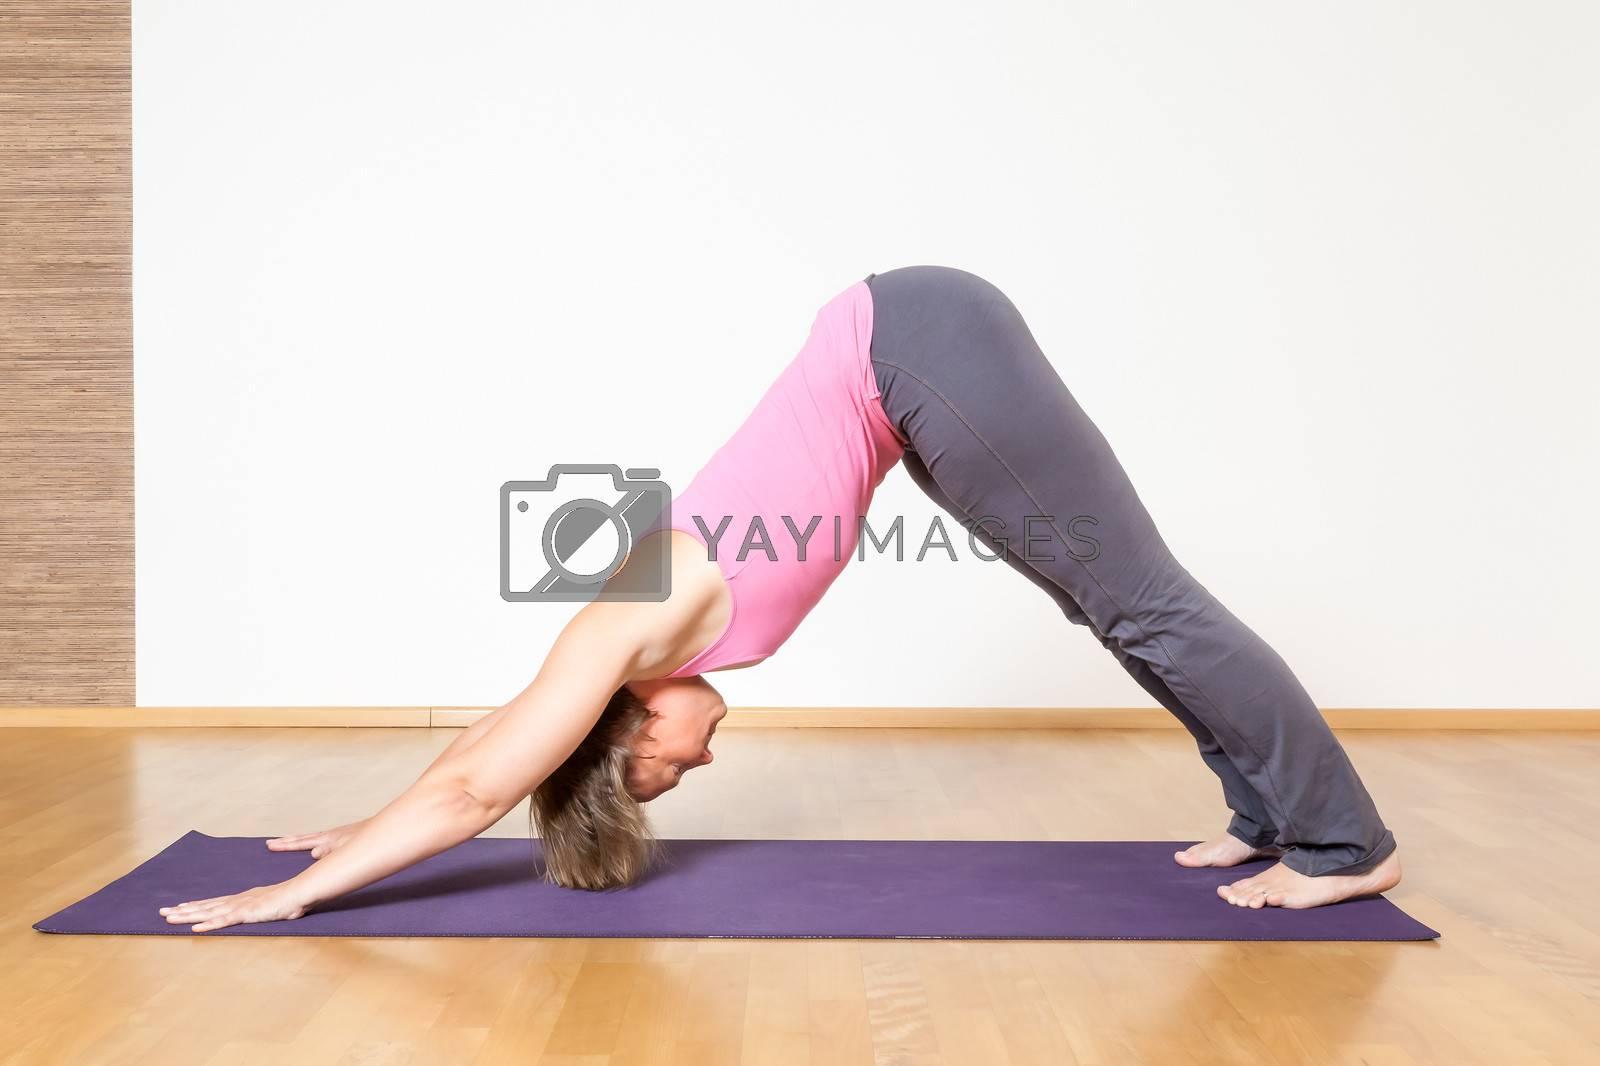 An image of a woman doing yoga